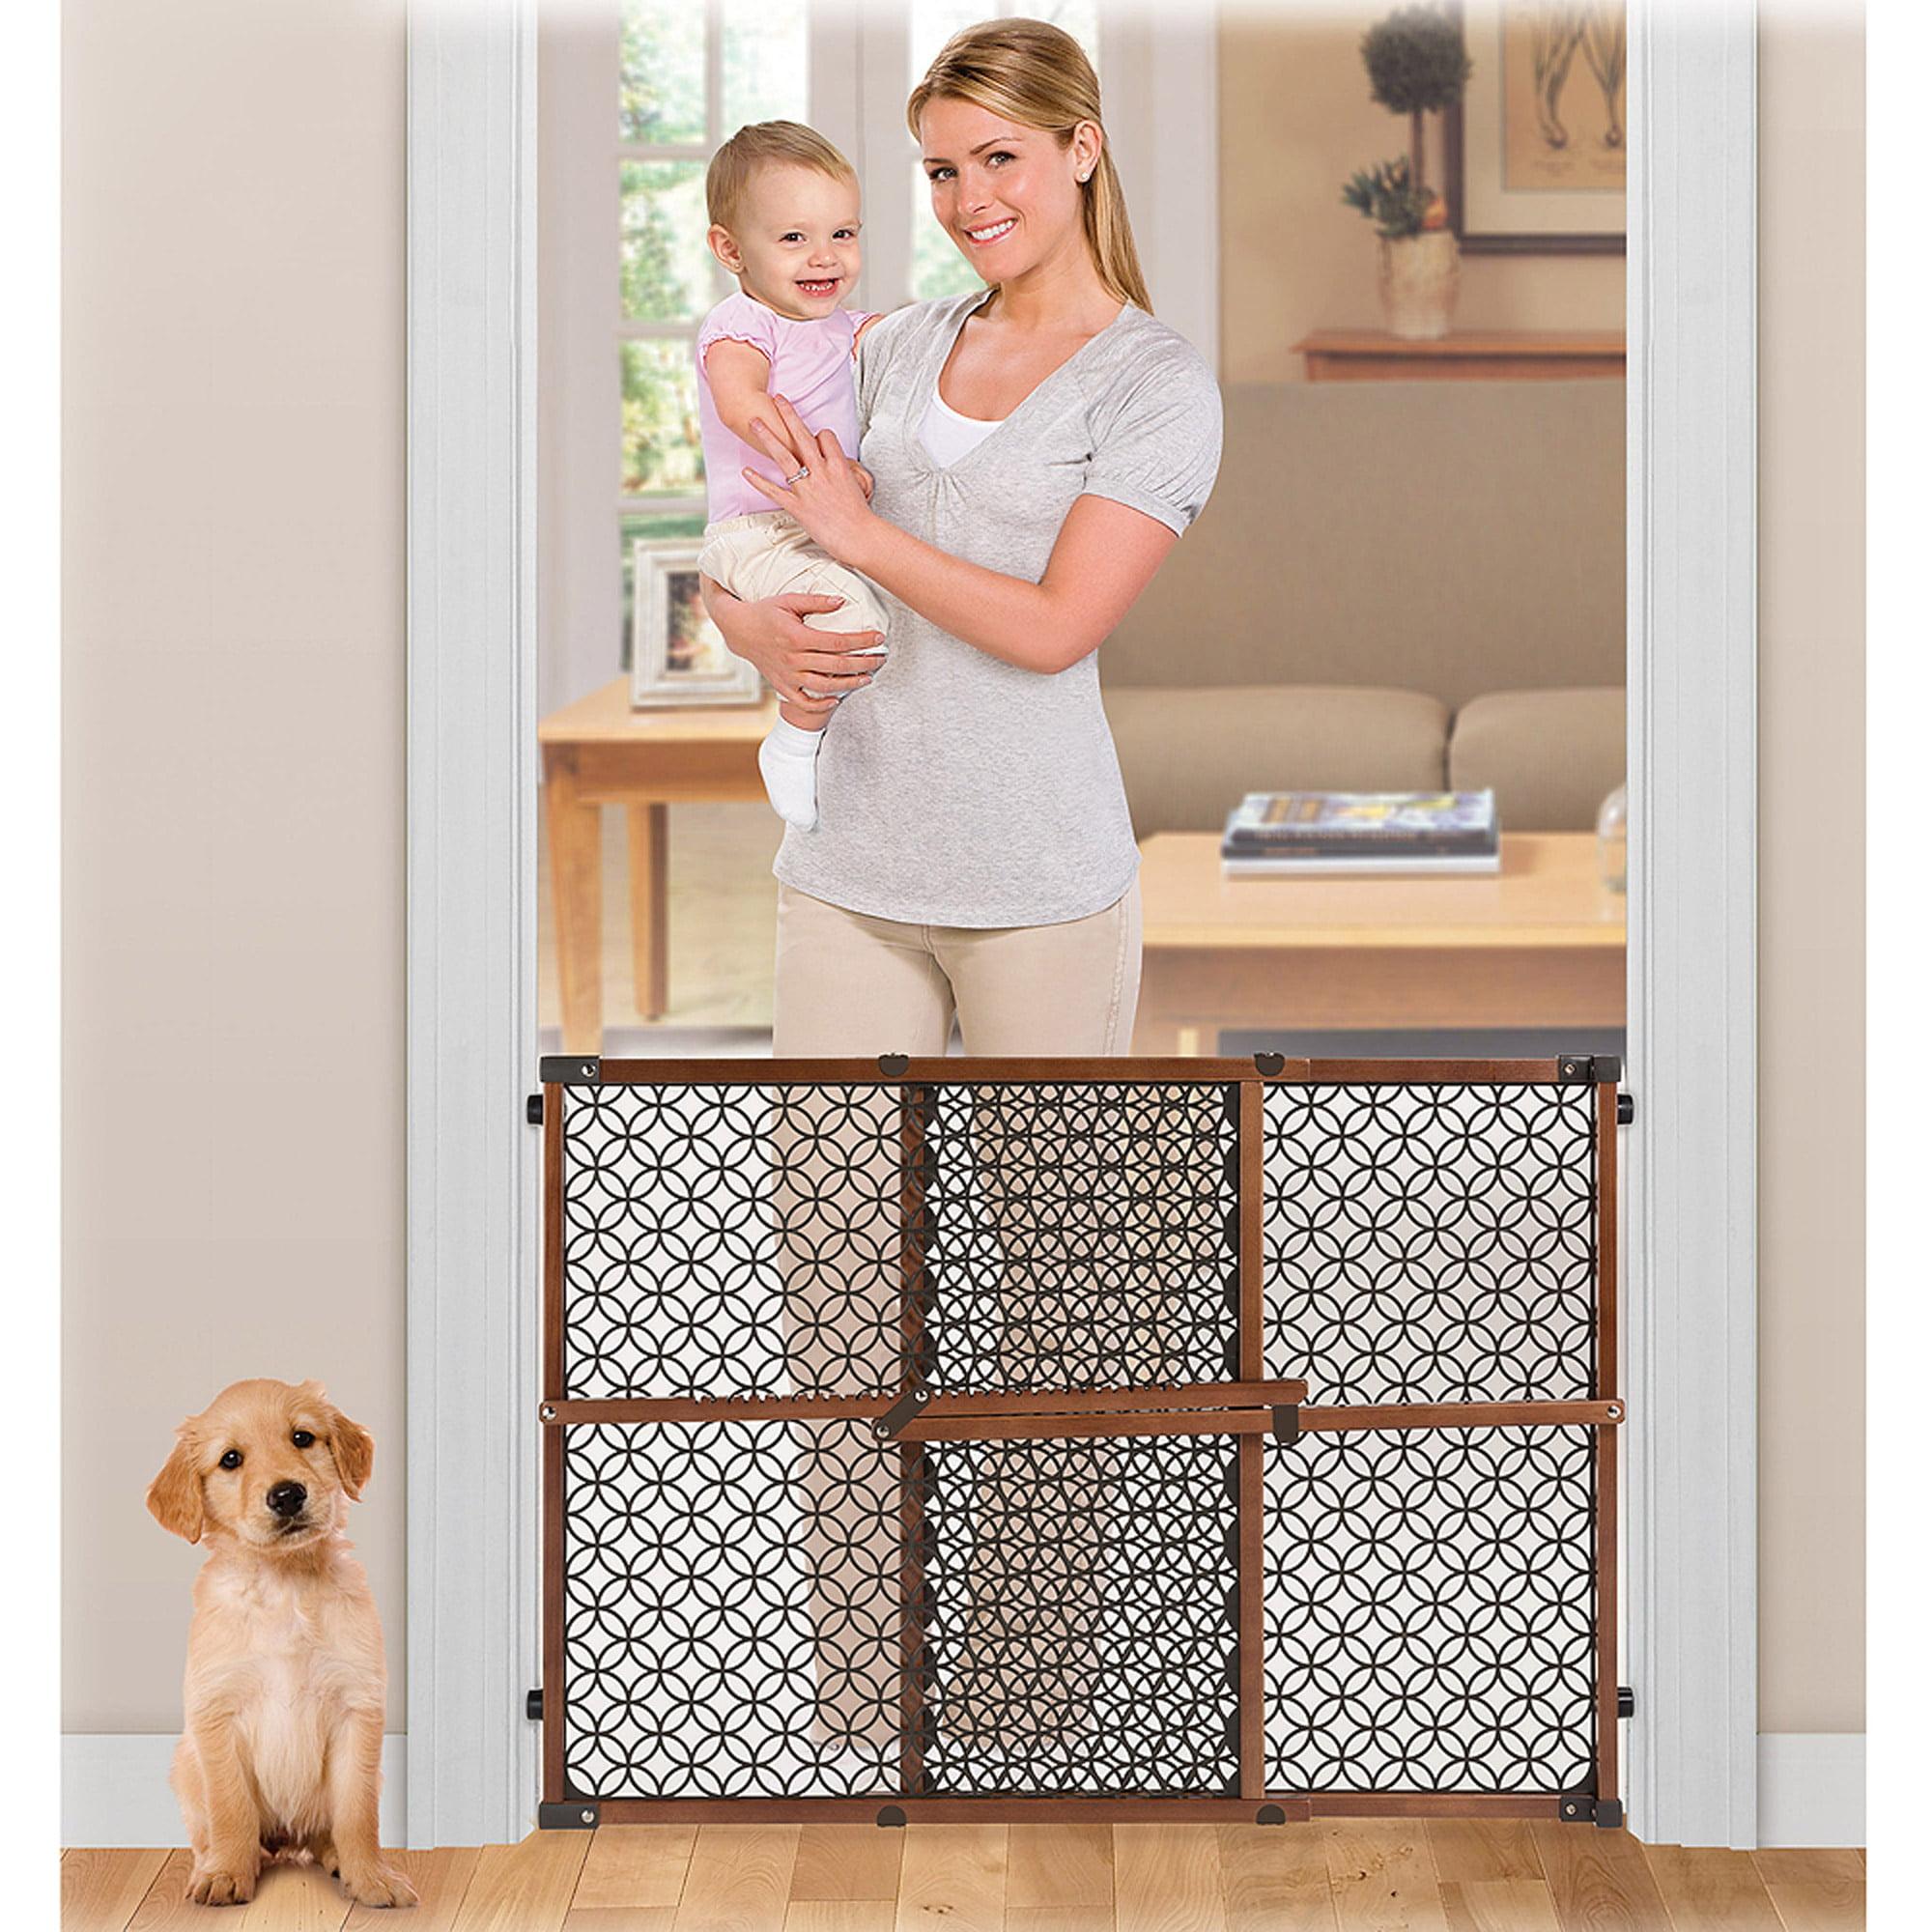 Summer Infant Secure Pressure Mount Wood And Plastic Deco Gate